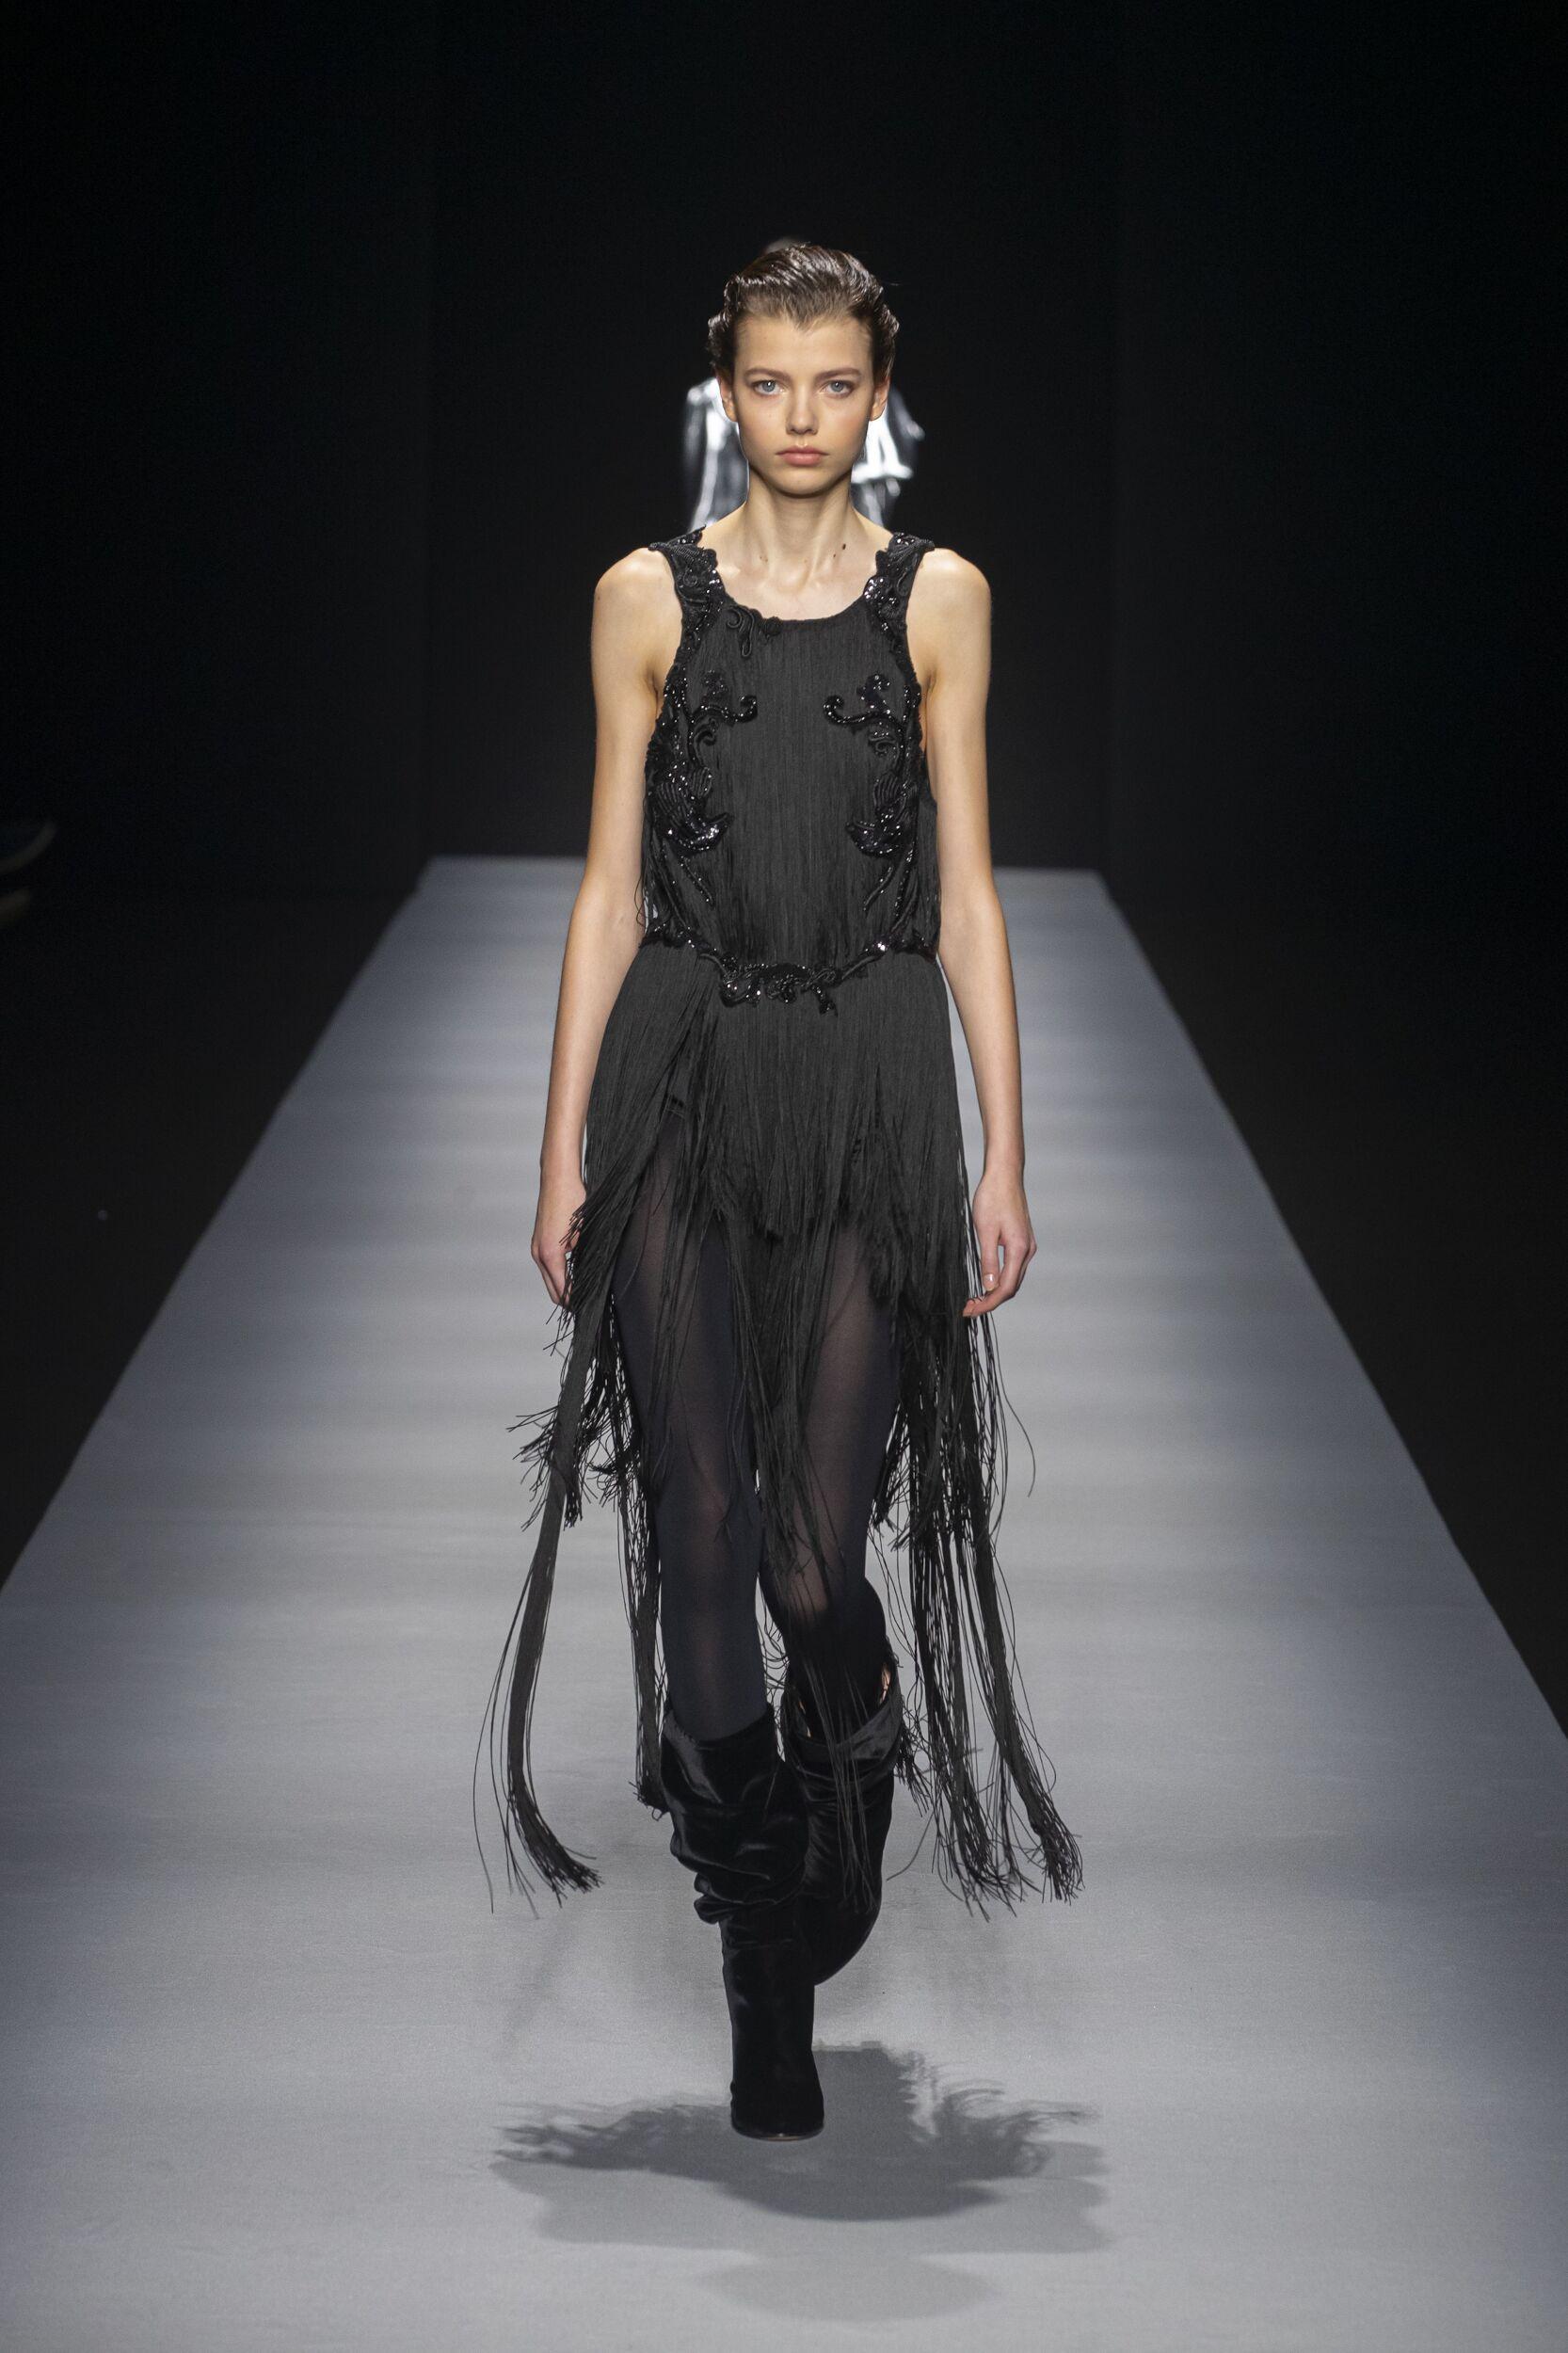 2020 Catwalk Alberta Ferretti Woman Fashion Show Winter